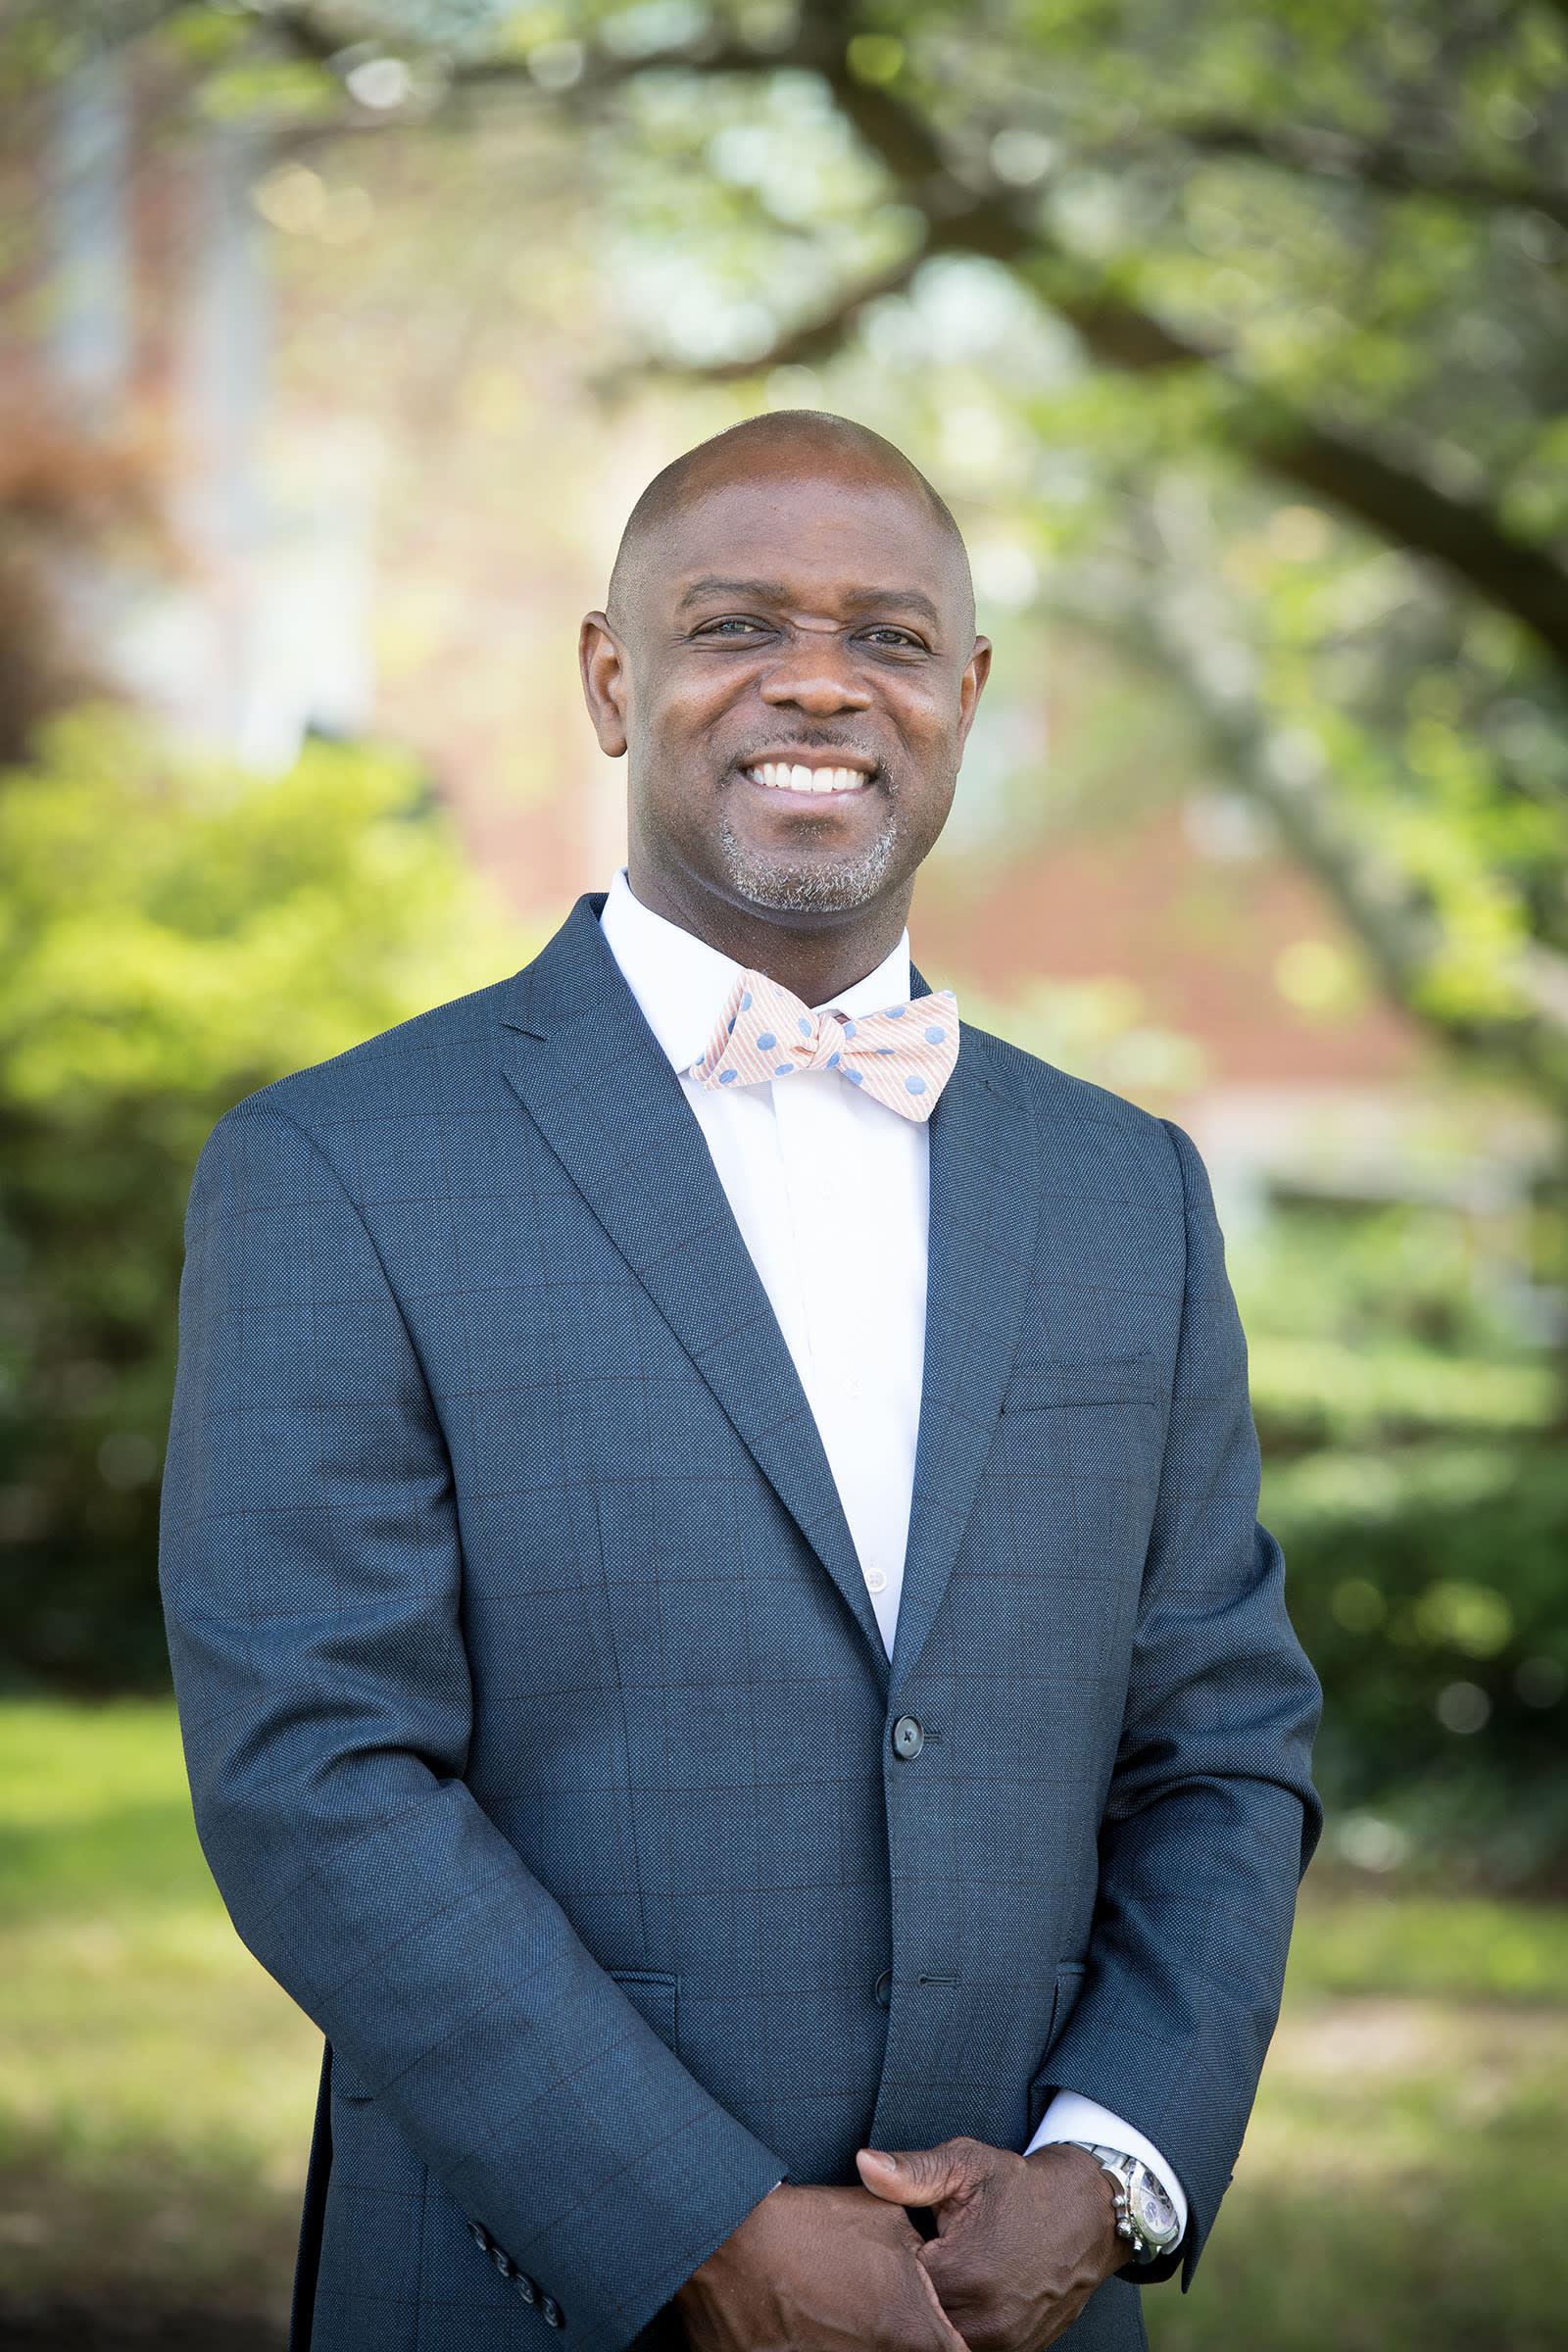 Headshot of Head of School Dr. Edward M. Trusty Jr.